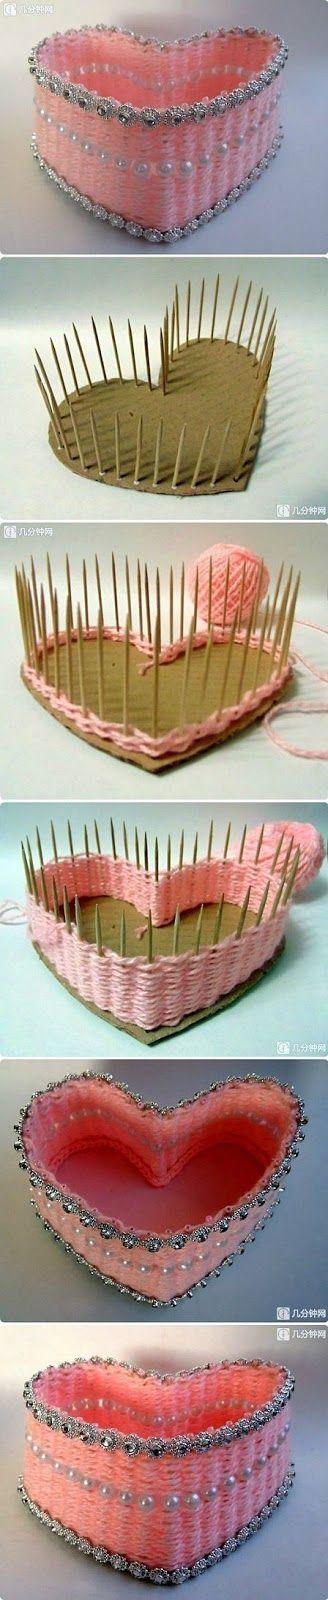 Make a Lovely Heart Box